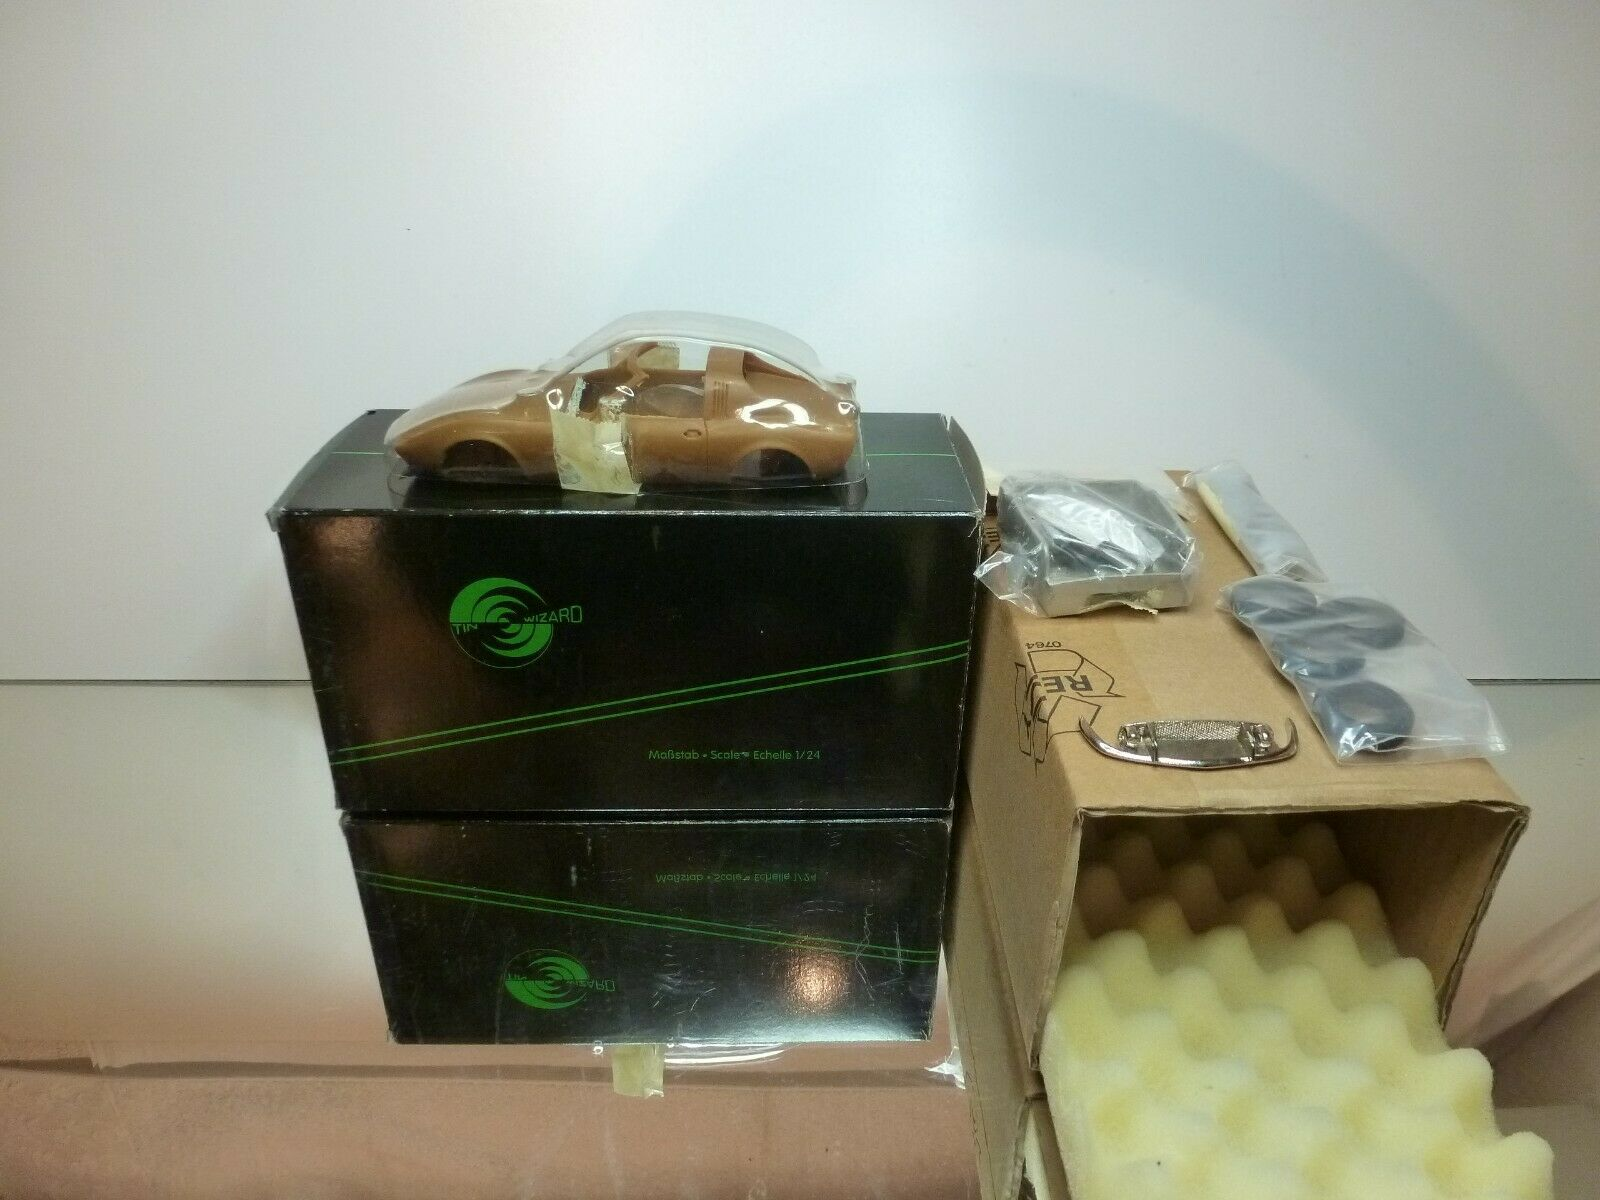 TIN WIZARD KIT unbuilt 8060 OPEL GT AERO - 1 24 RARE -  UNBUILT CONDITION IN BOX